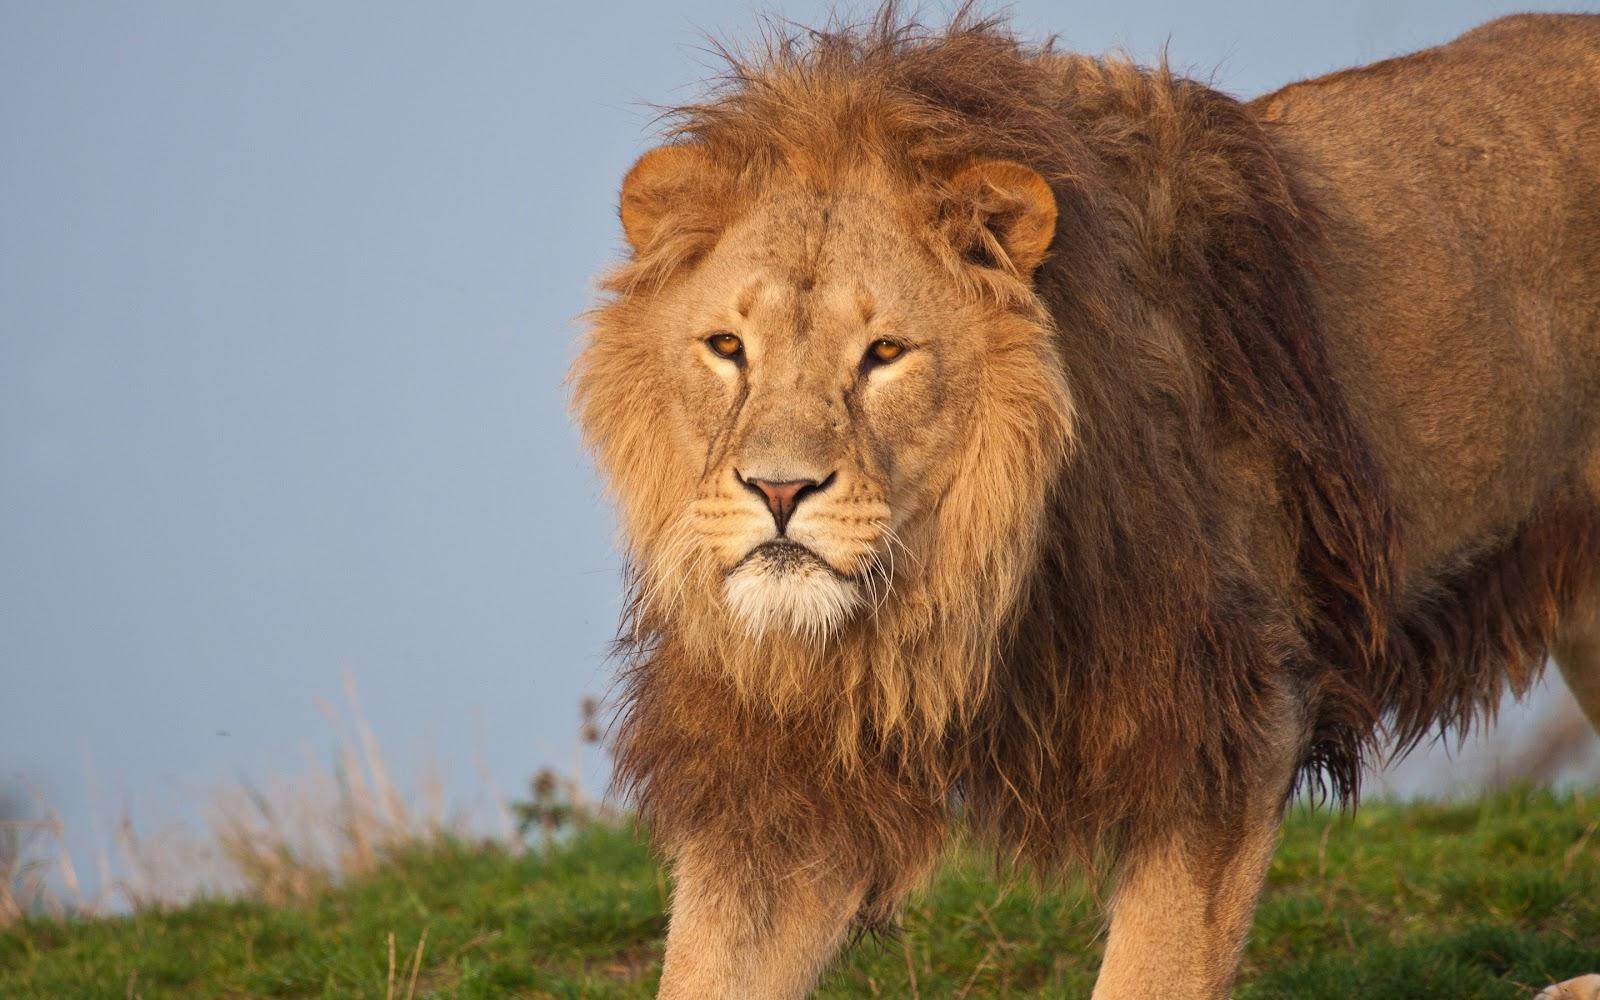 Angry Lion Wallpaper Hd 1080p Full Hd Beautiful Lion 1080p Wallpaper Hd Wallpapers